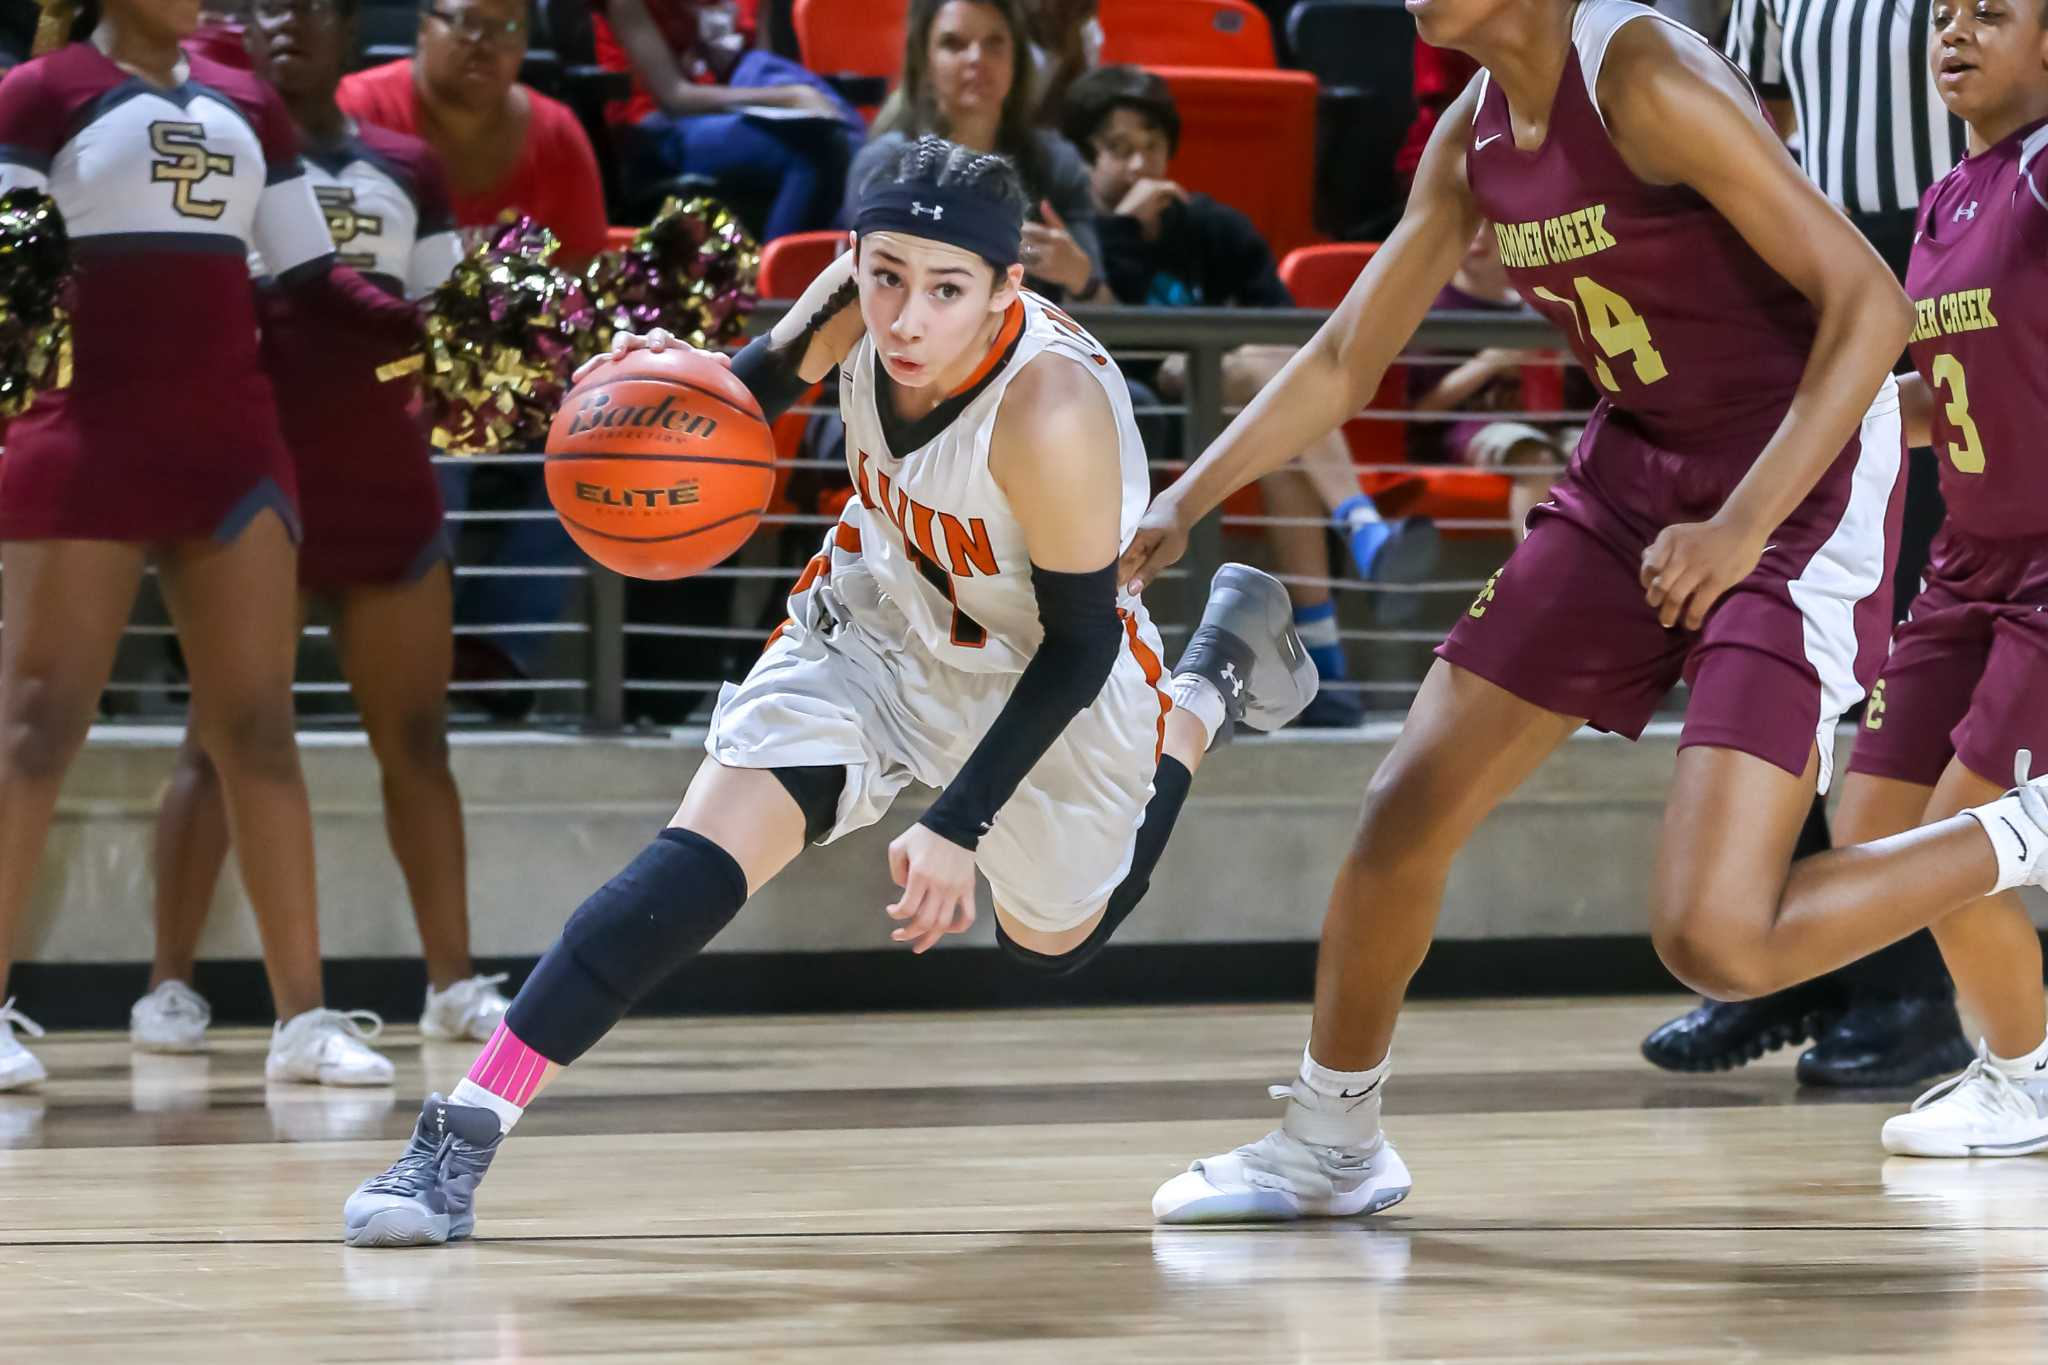 basketball houston teams hs preseason greater sports ball basket texas highschool game